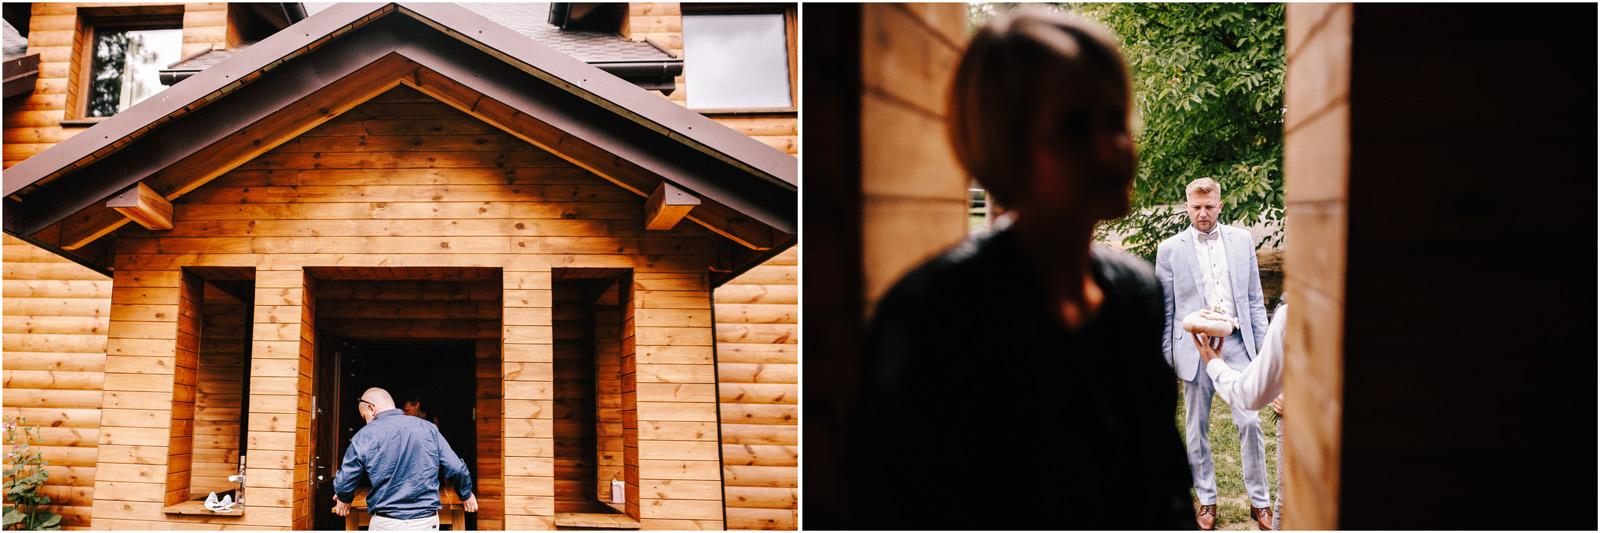 Agatka & Mati | garden party i impreza w stodole 24